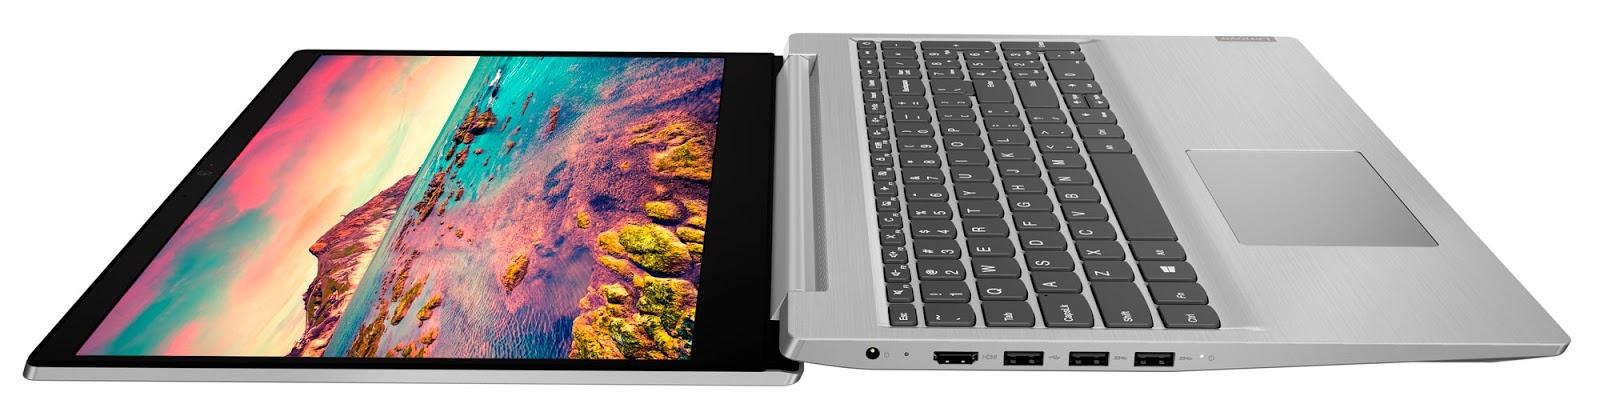 Фото 2. Ноутбук Lenovo ideapad S145-15IIL Platinum Grey (81W8007WRE)